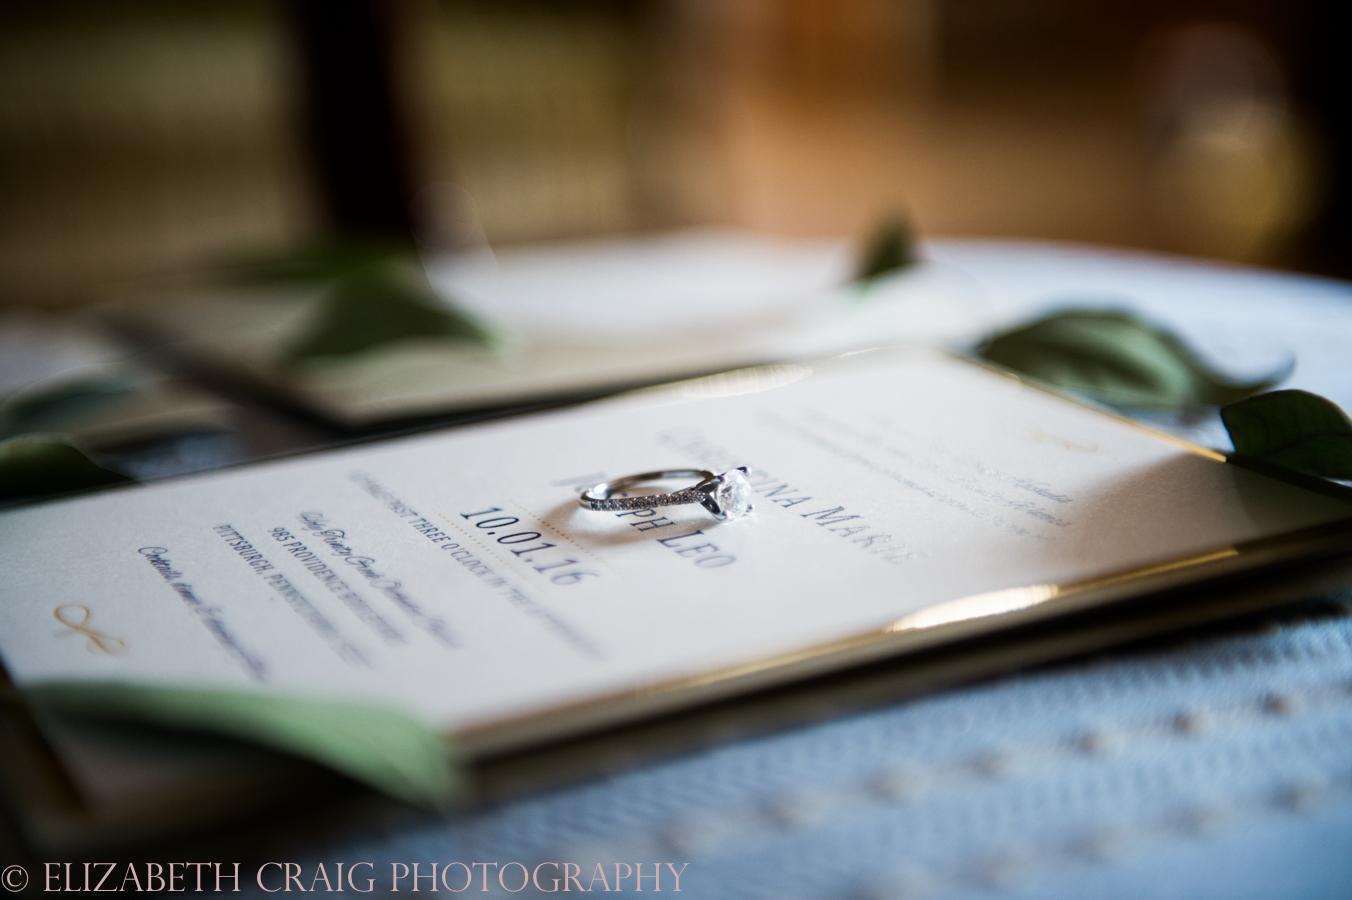 pittsburgh-greek-weddings-fairmont-weddings-receptions-elizabeth-craig-photohgraphy-004